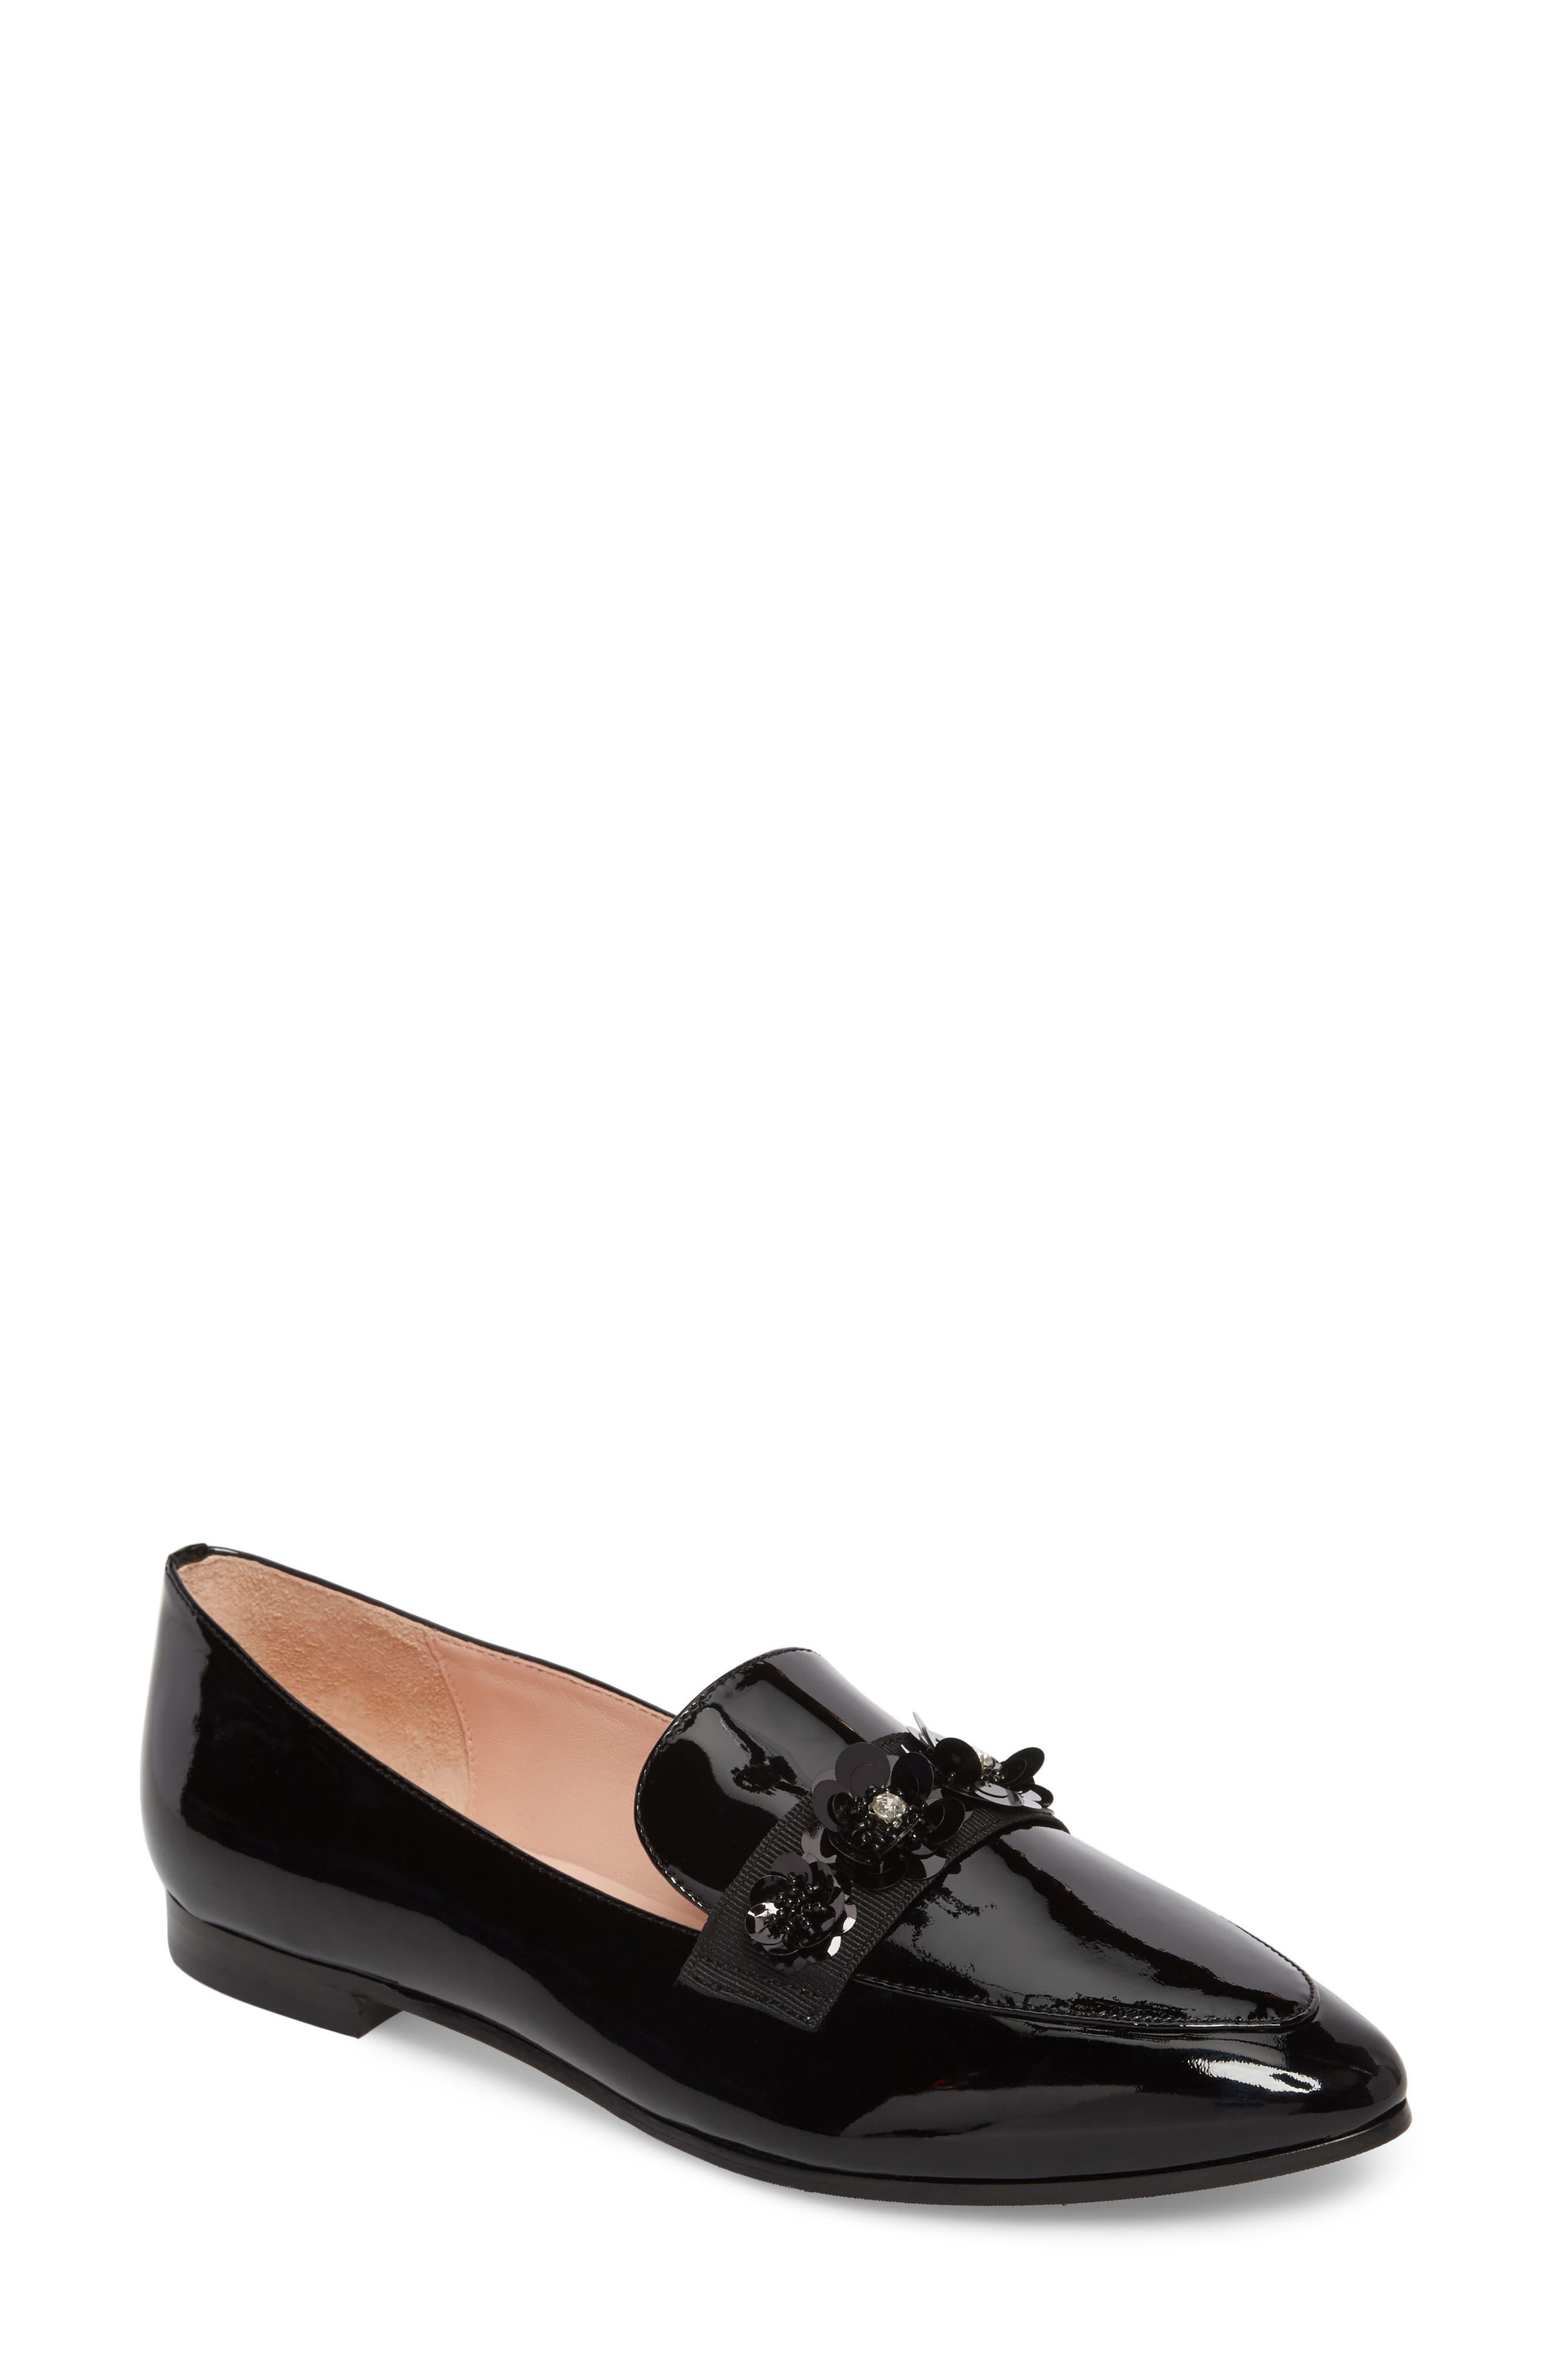 cleo embellished loafer,                             Main thumbnail 1, color,                             001